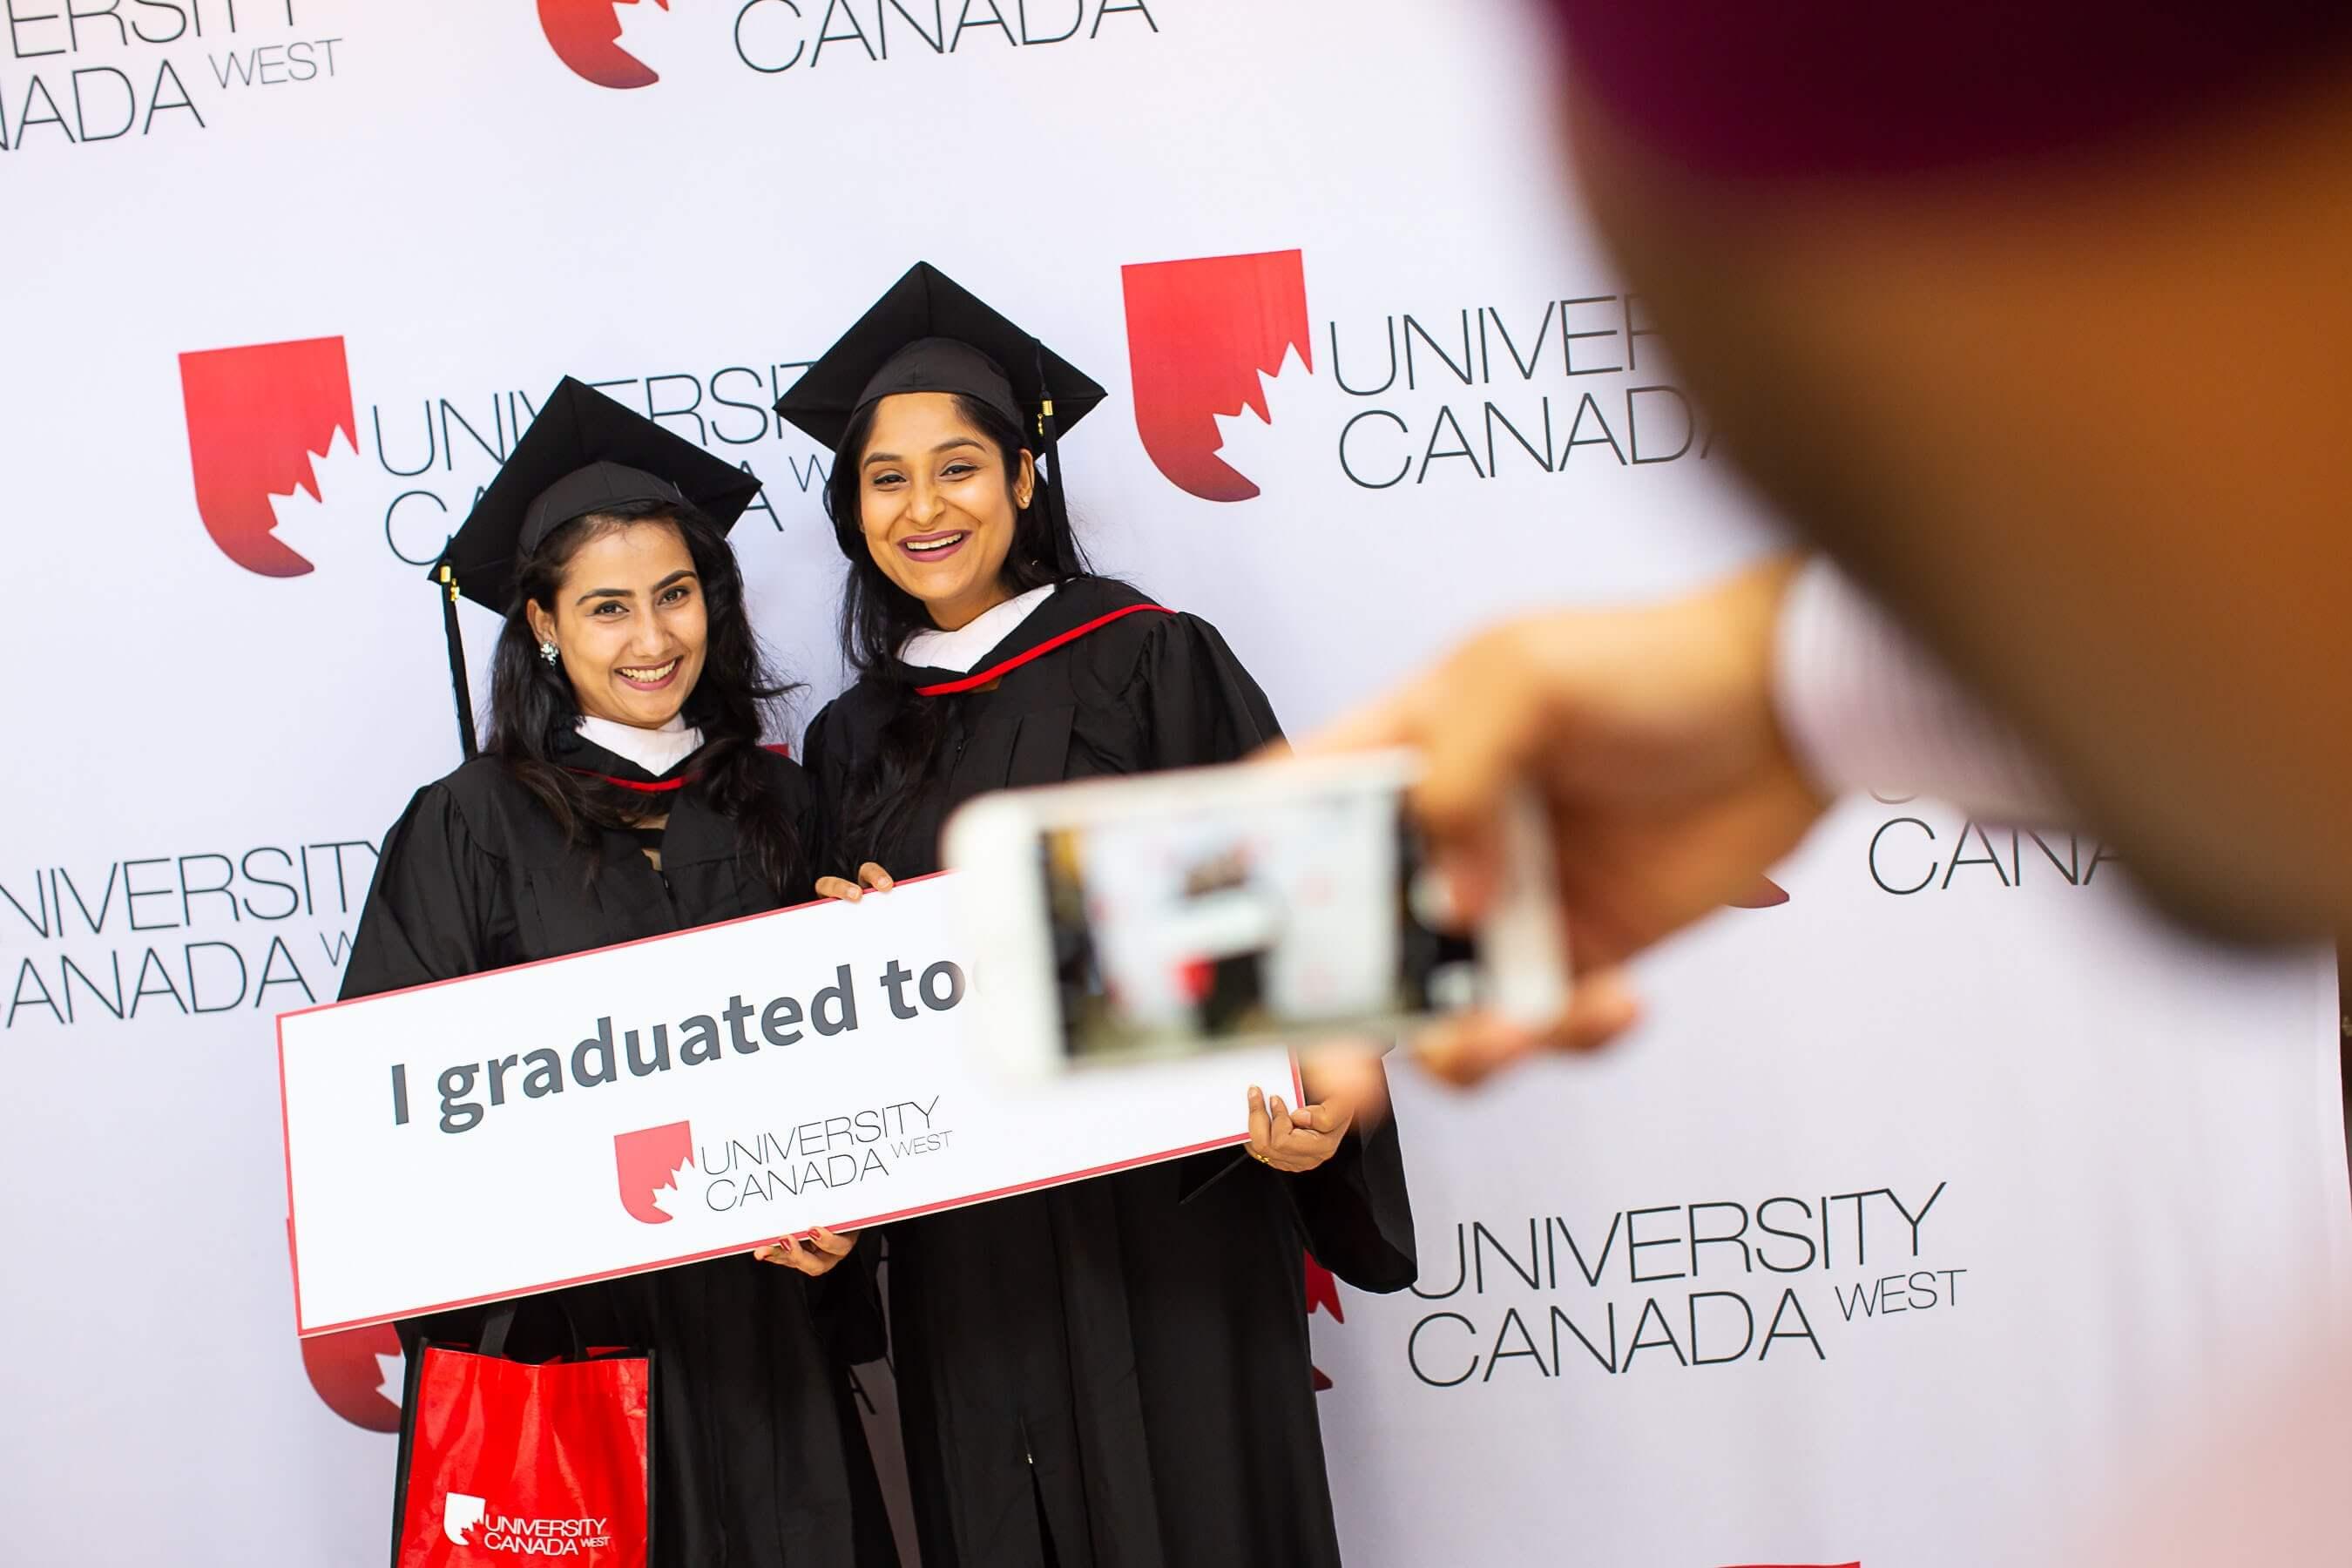 Đại học Canada West